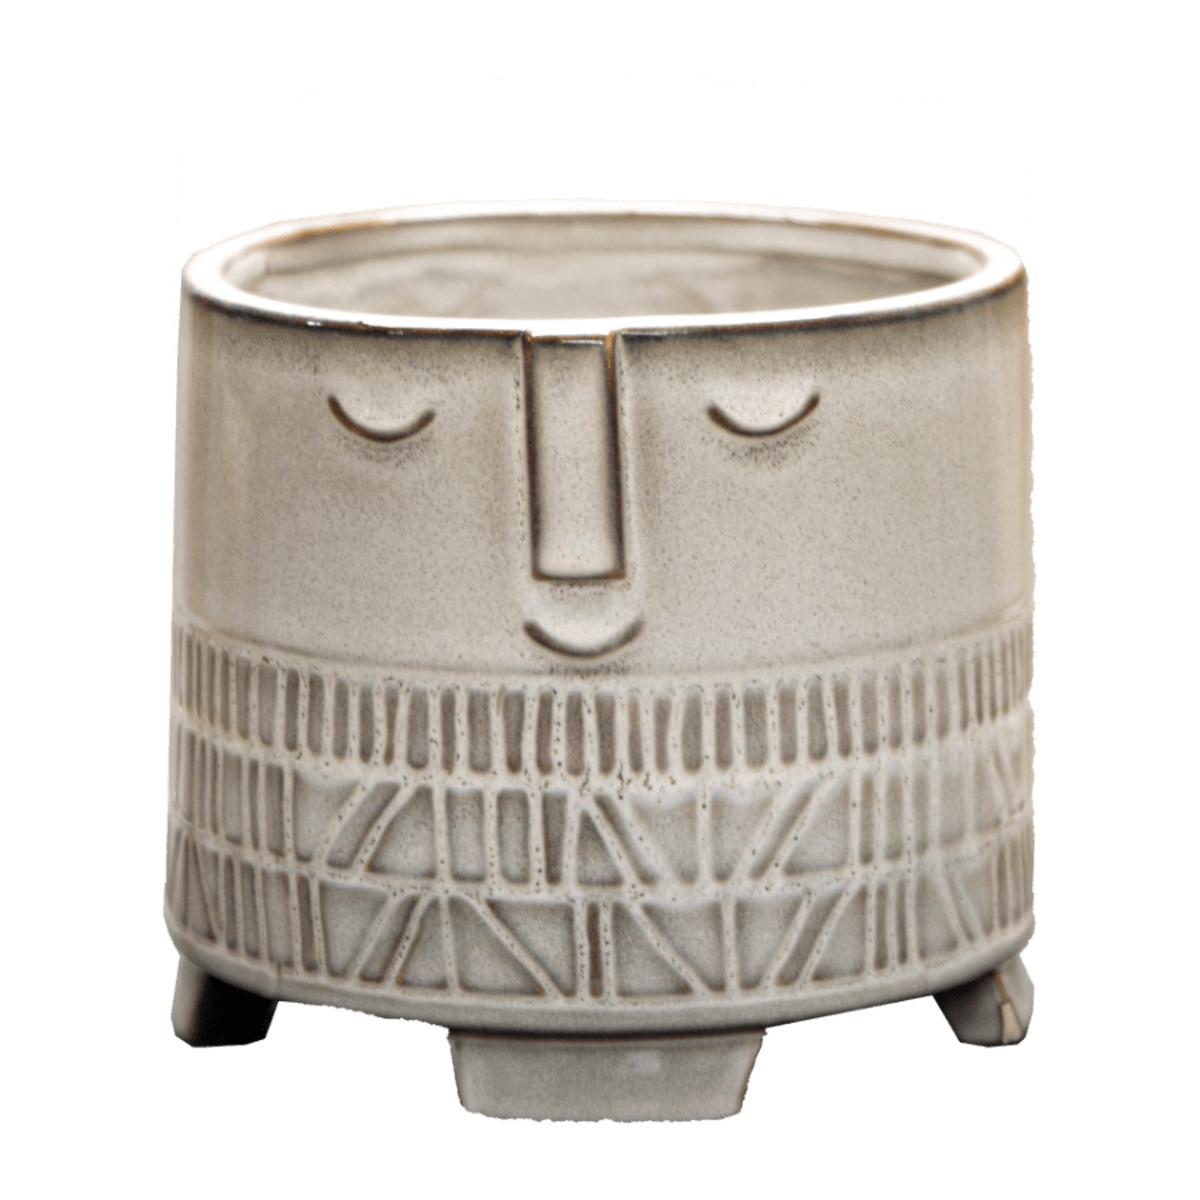 Bild 1 von LIVING ART     Keramik Sortiment